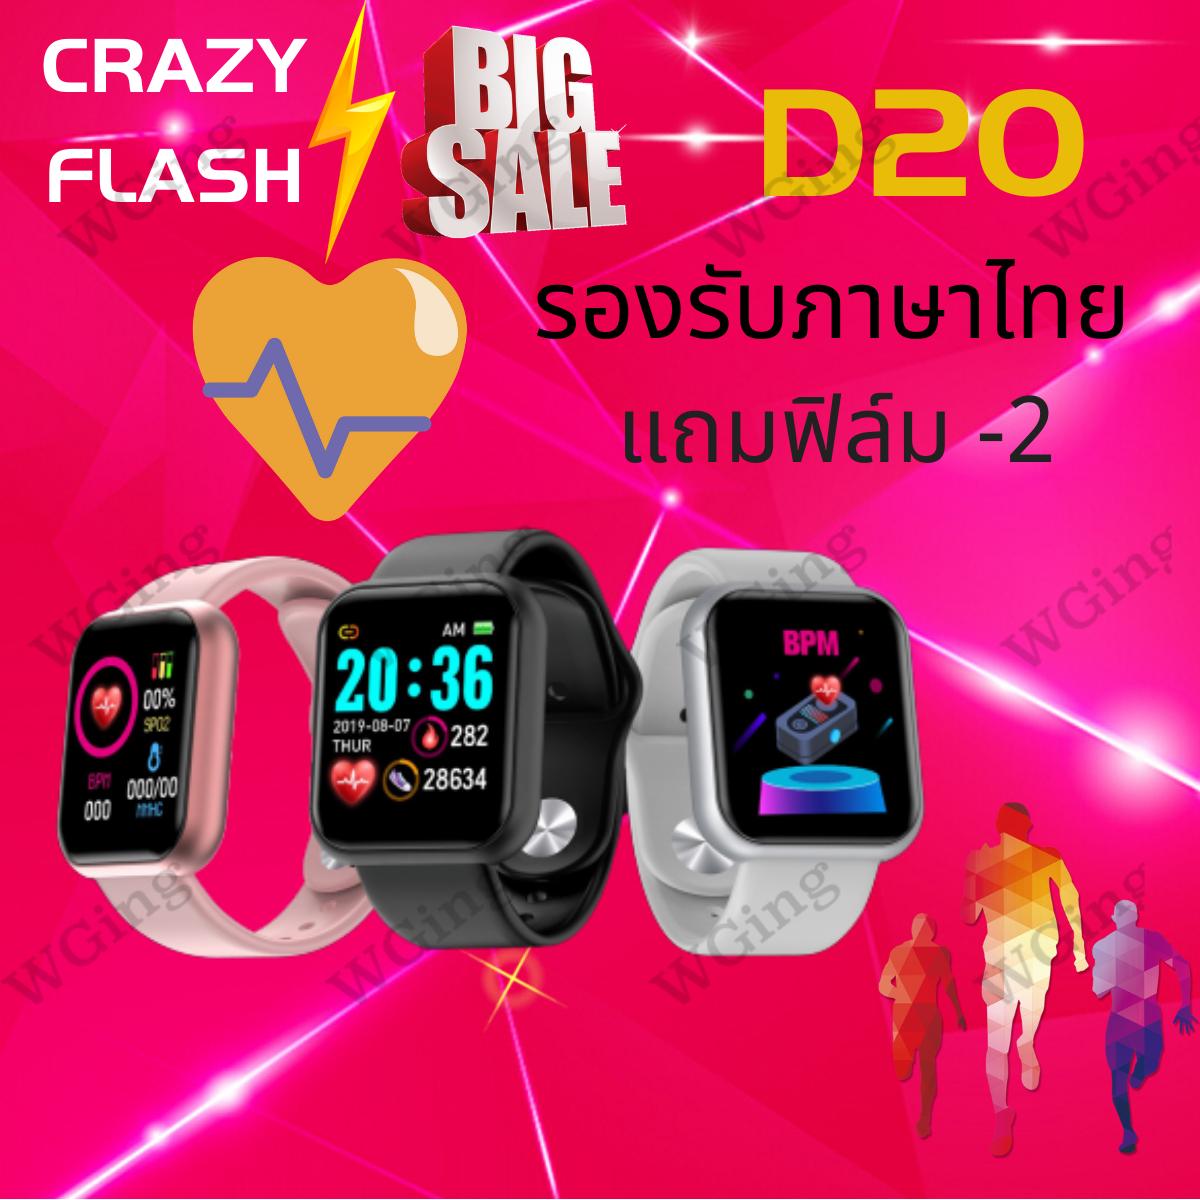 Wgingsmart Watch นาฬิกาสมาร์ทวอทช์ รุ่น D20 นาฬิกาอัจฉริยะ ฟิตเนสแทรคเกอร์ สายรัดข้อมืออัจฉริยะ สายรัดข้อมือเพื่อสุขภาพ นาฬิกาข้อมือ นาฬิกา นาฬิกาแฟชั่น นาฬิการุ่นใหม่ Smart Band Fitness Tracker Smart Bracelet รุ่นใหม่ปี 2020.